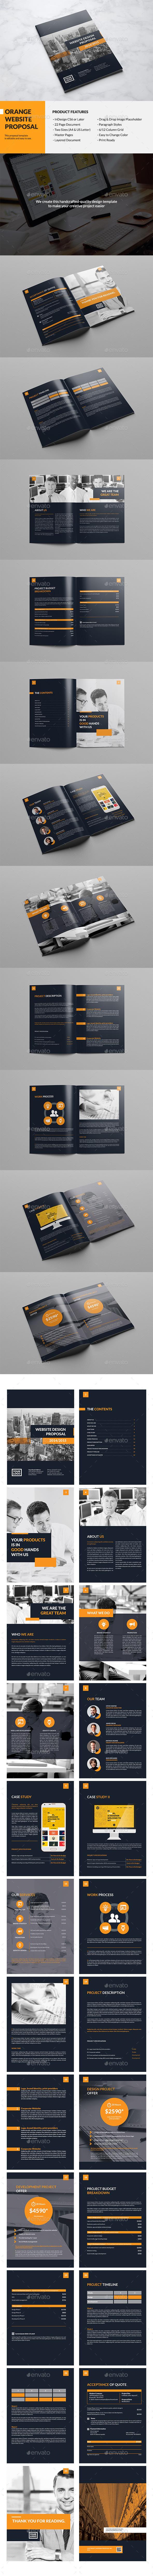 Orange Website Proposal - Proposals & Invoices Stationery